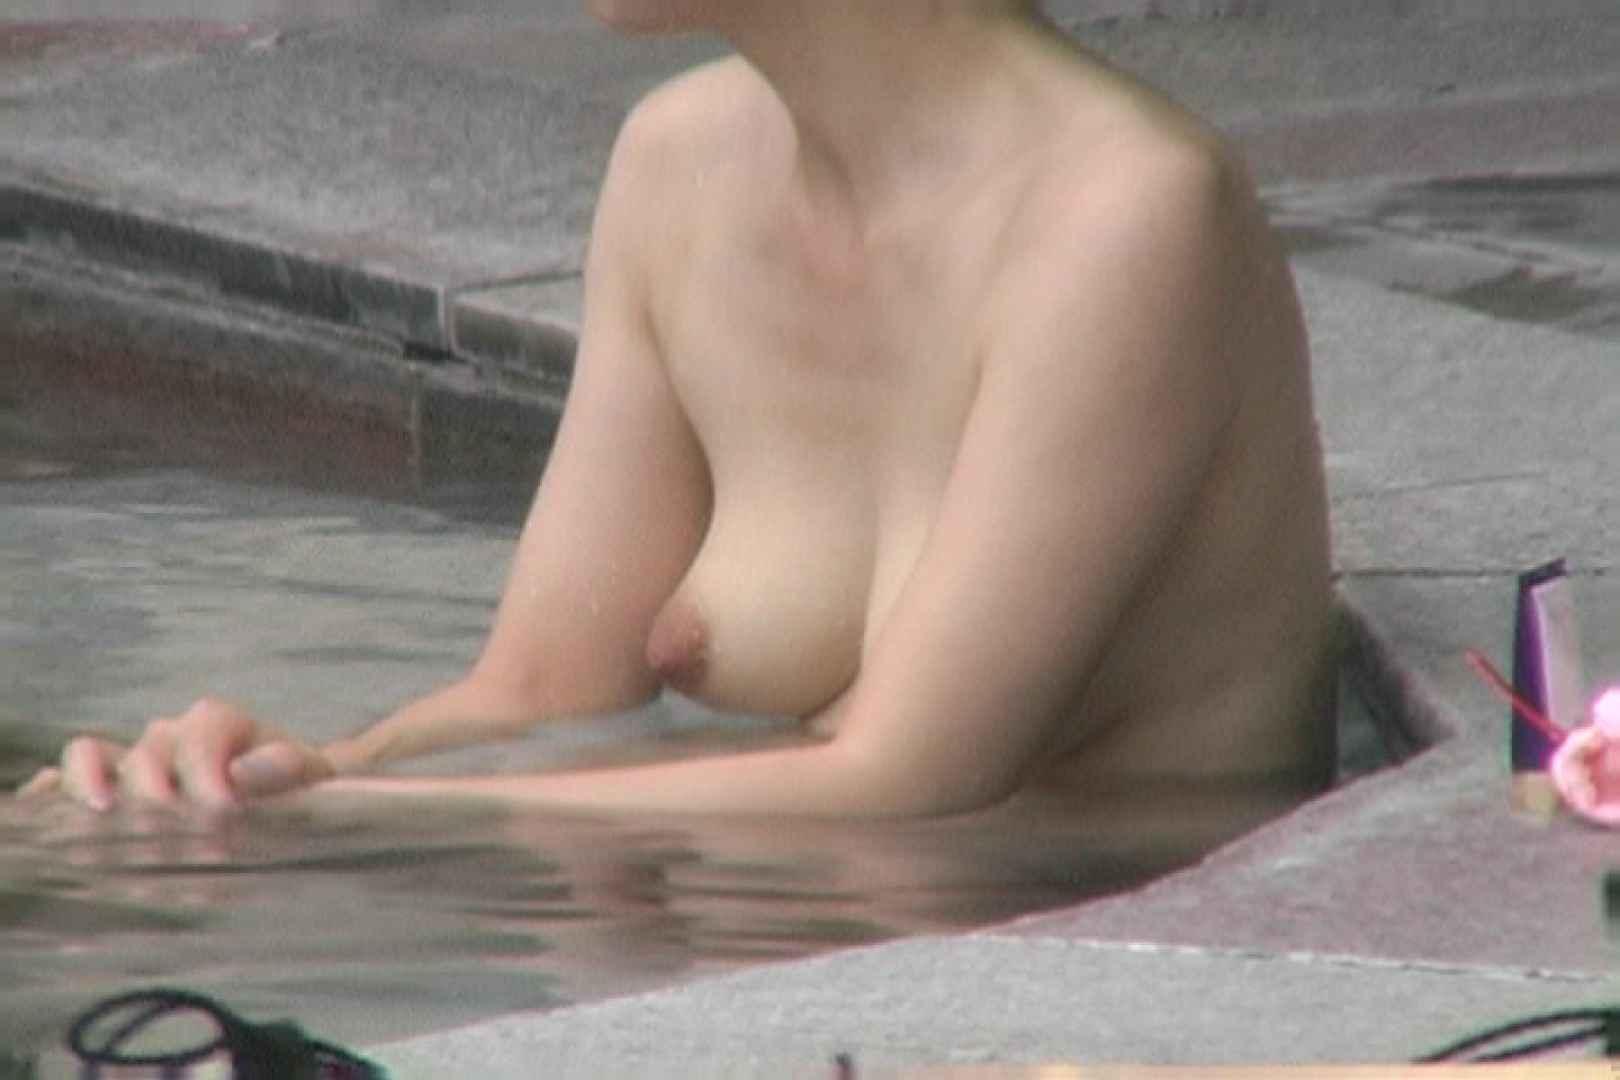 Aquaな露天風呂Vol.642 盗撮師作品 セックス画像 86pic 26